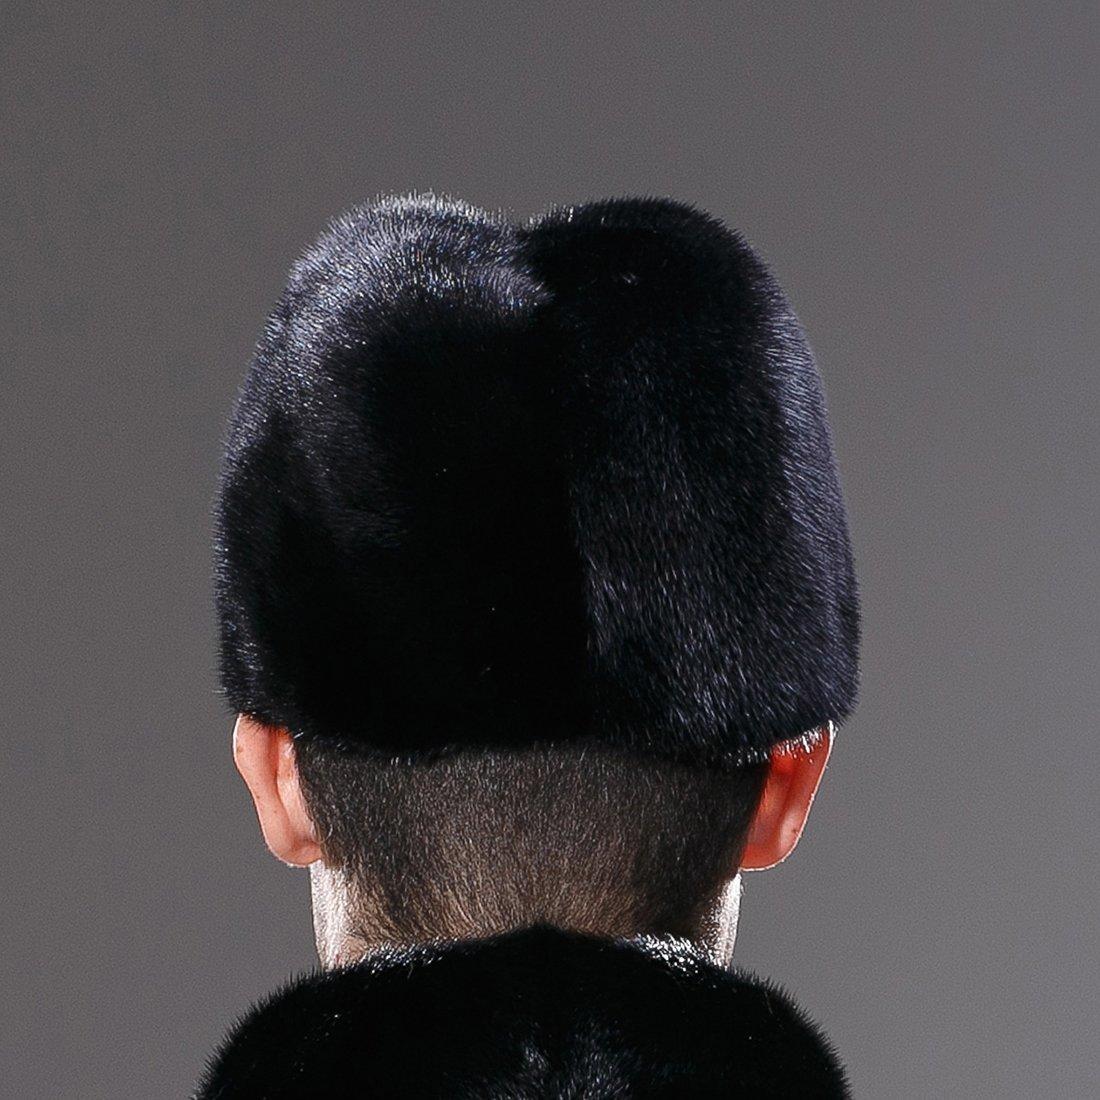 URSFUR Mens Winter Russian Cossack Hat Real Mink Fur Cap Black by URSFUR (Image #6)